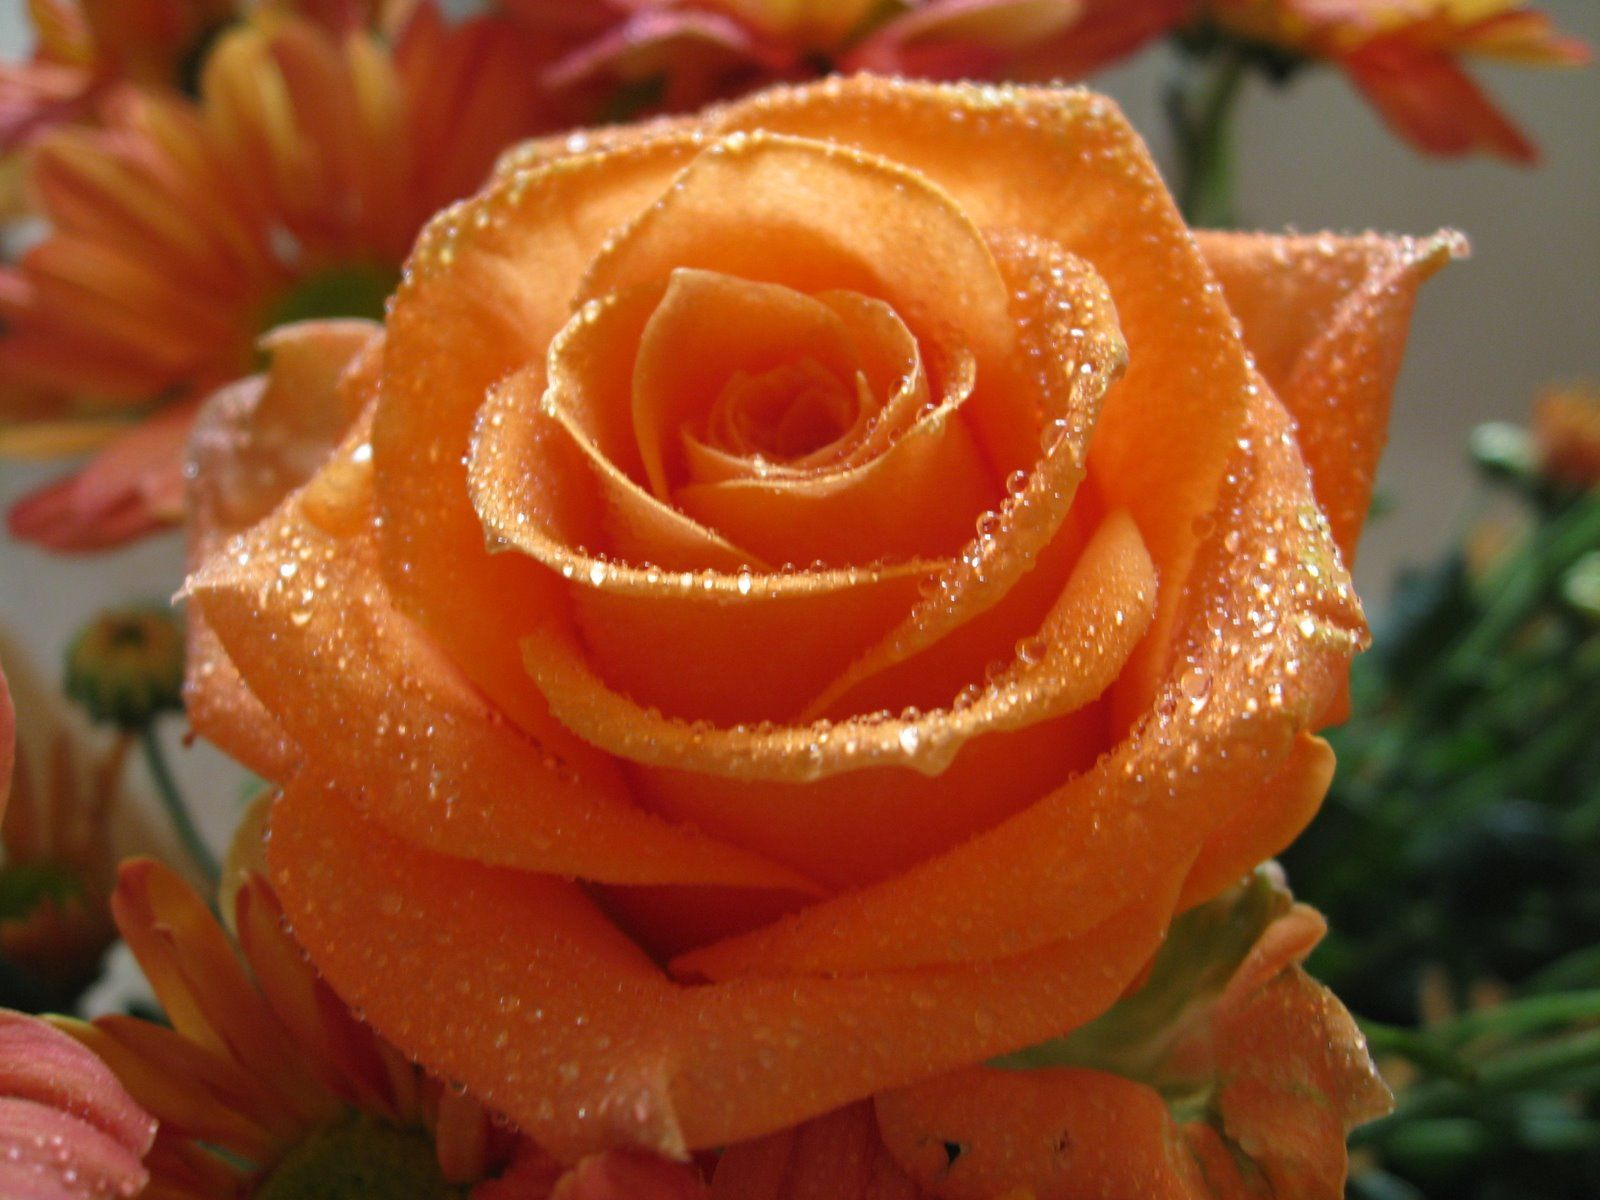 Orange rose pictures for wallpaper flowers for flower - Peach rose wallpaper ...